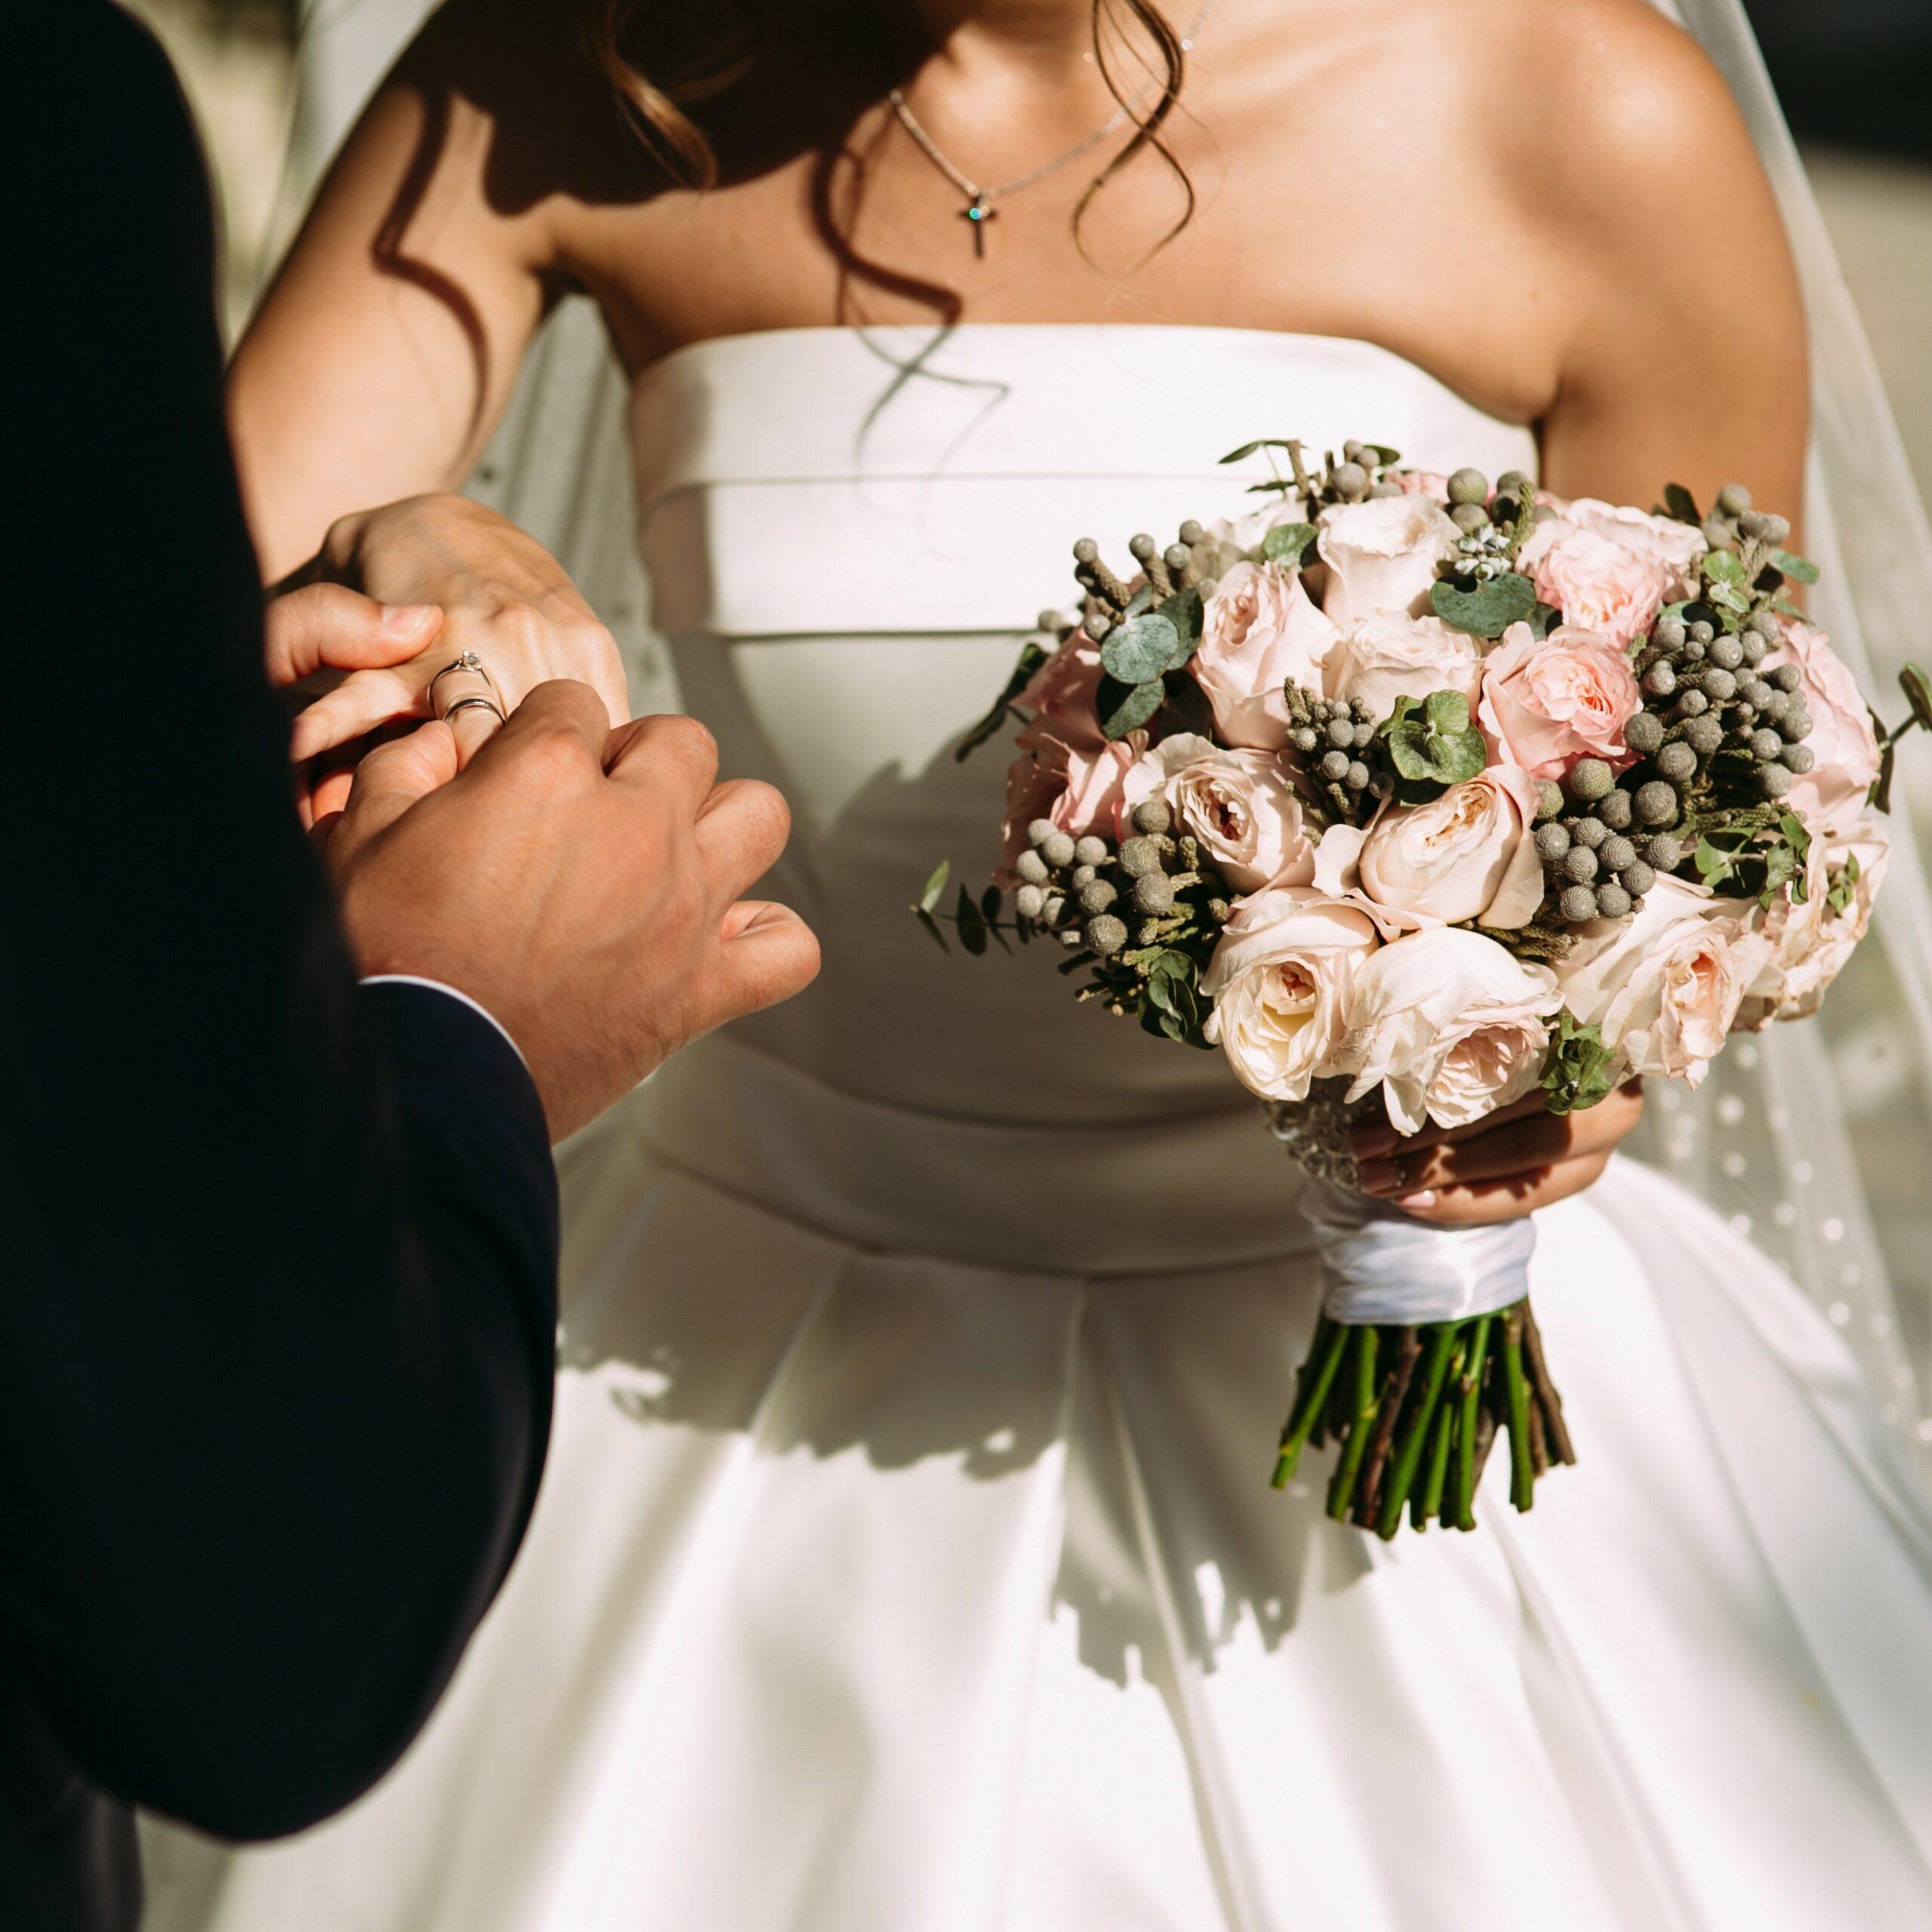 Wedding,Ring,On,The,Bride's,Finger